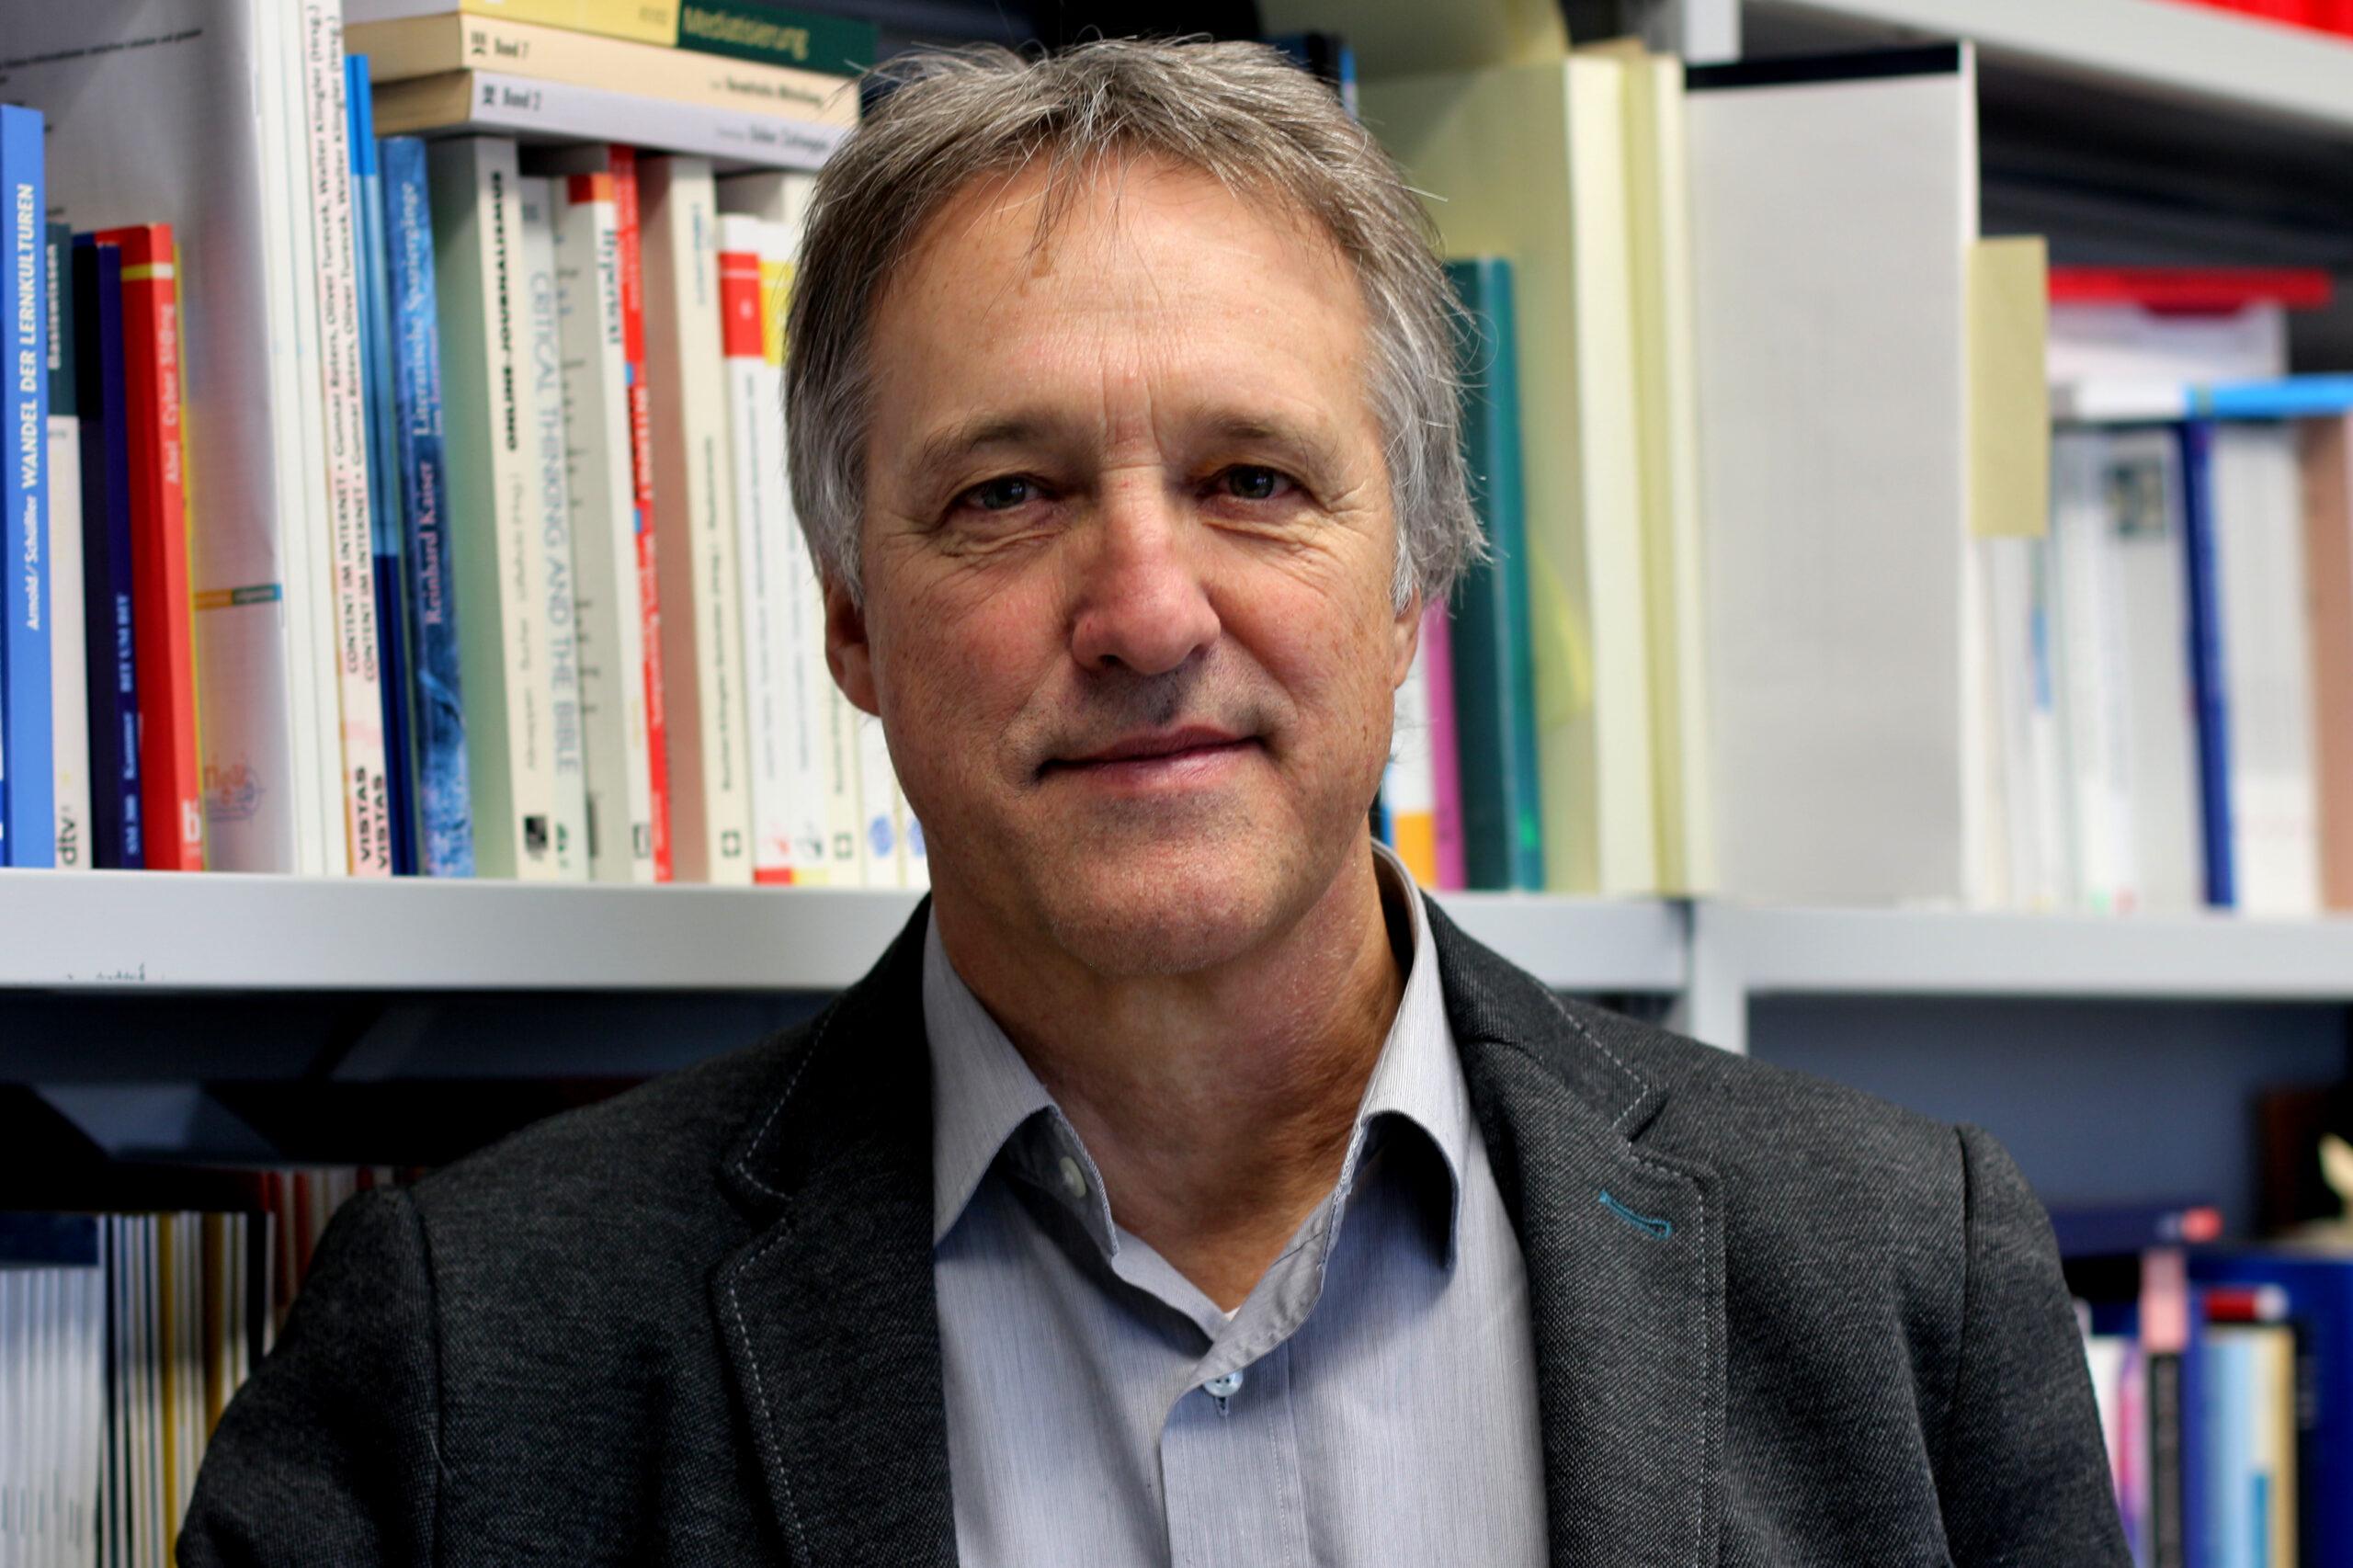 Hans-Jürgen Bucher